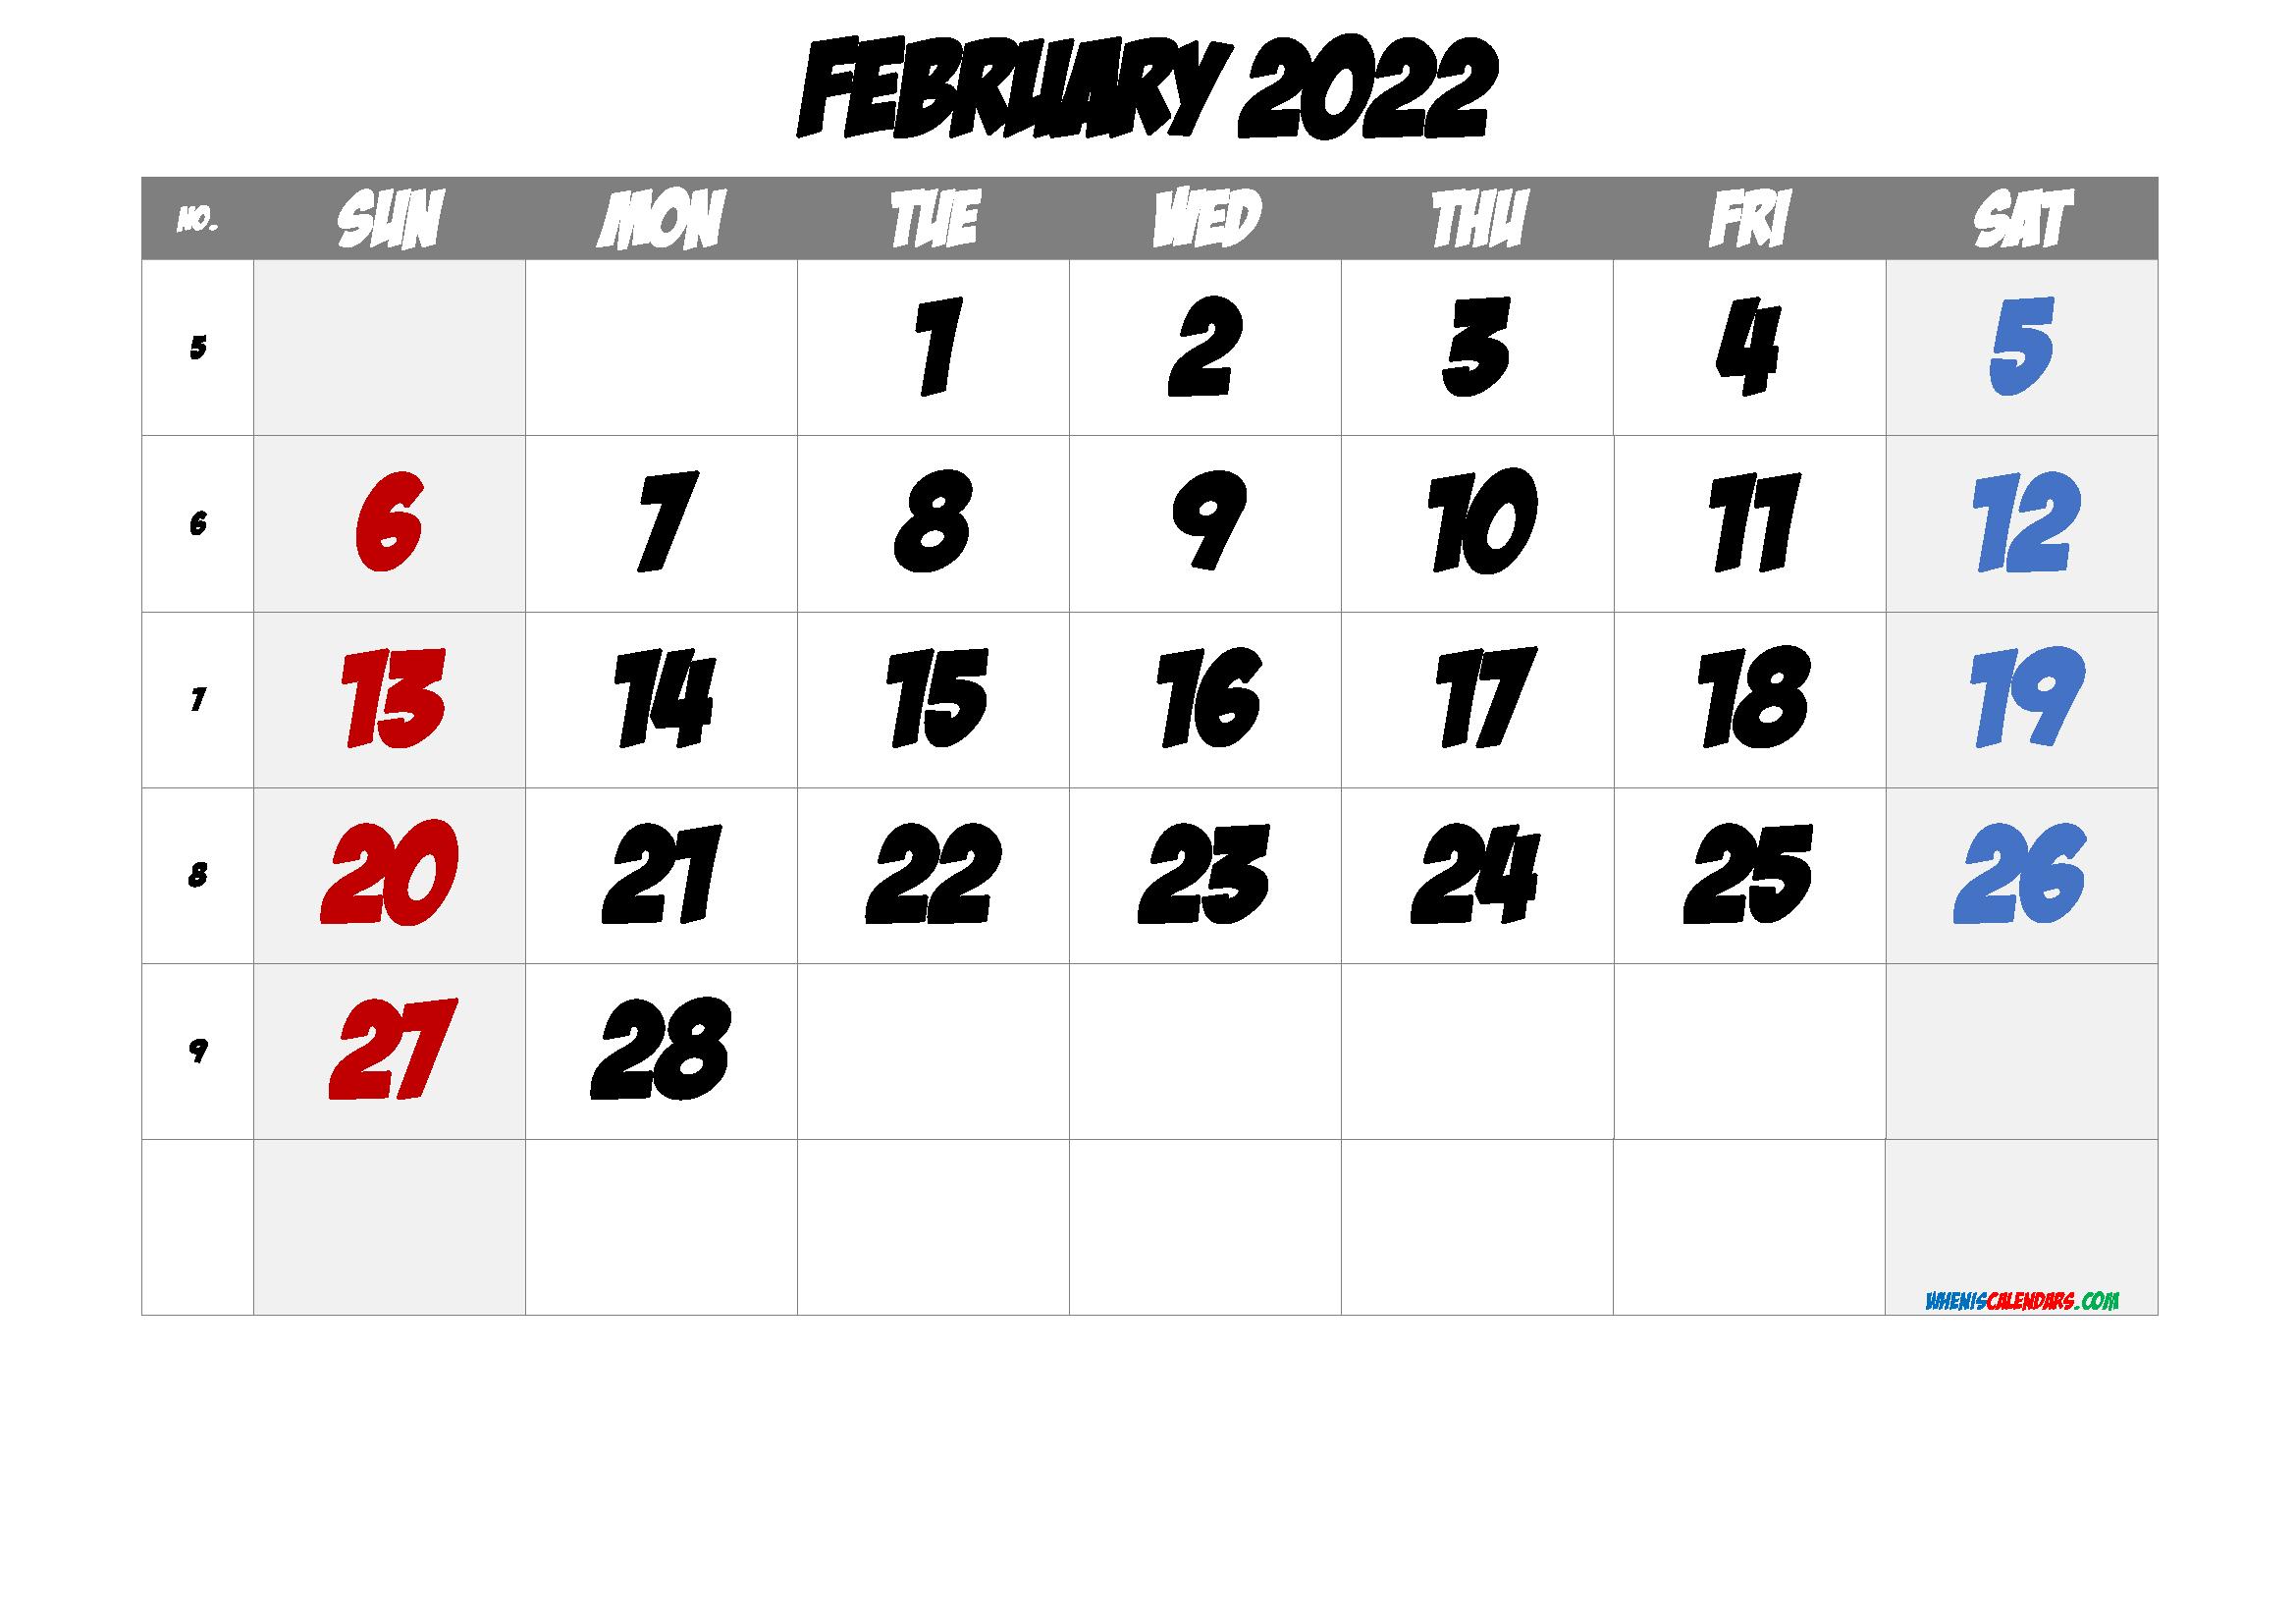 Free Printable 2022 February Calendar throughout 2022 Free Big Primt For Feb 2022